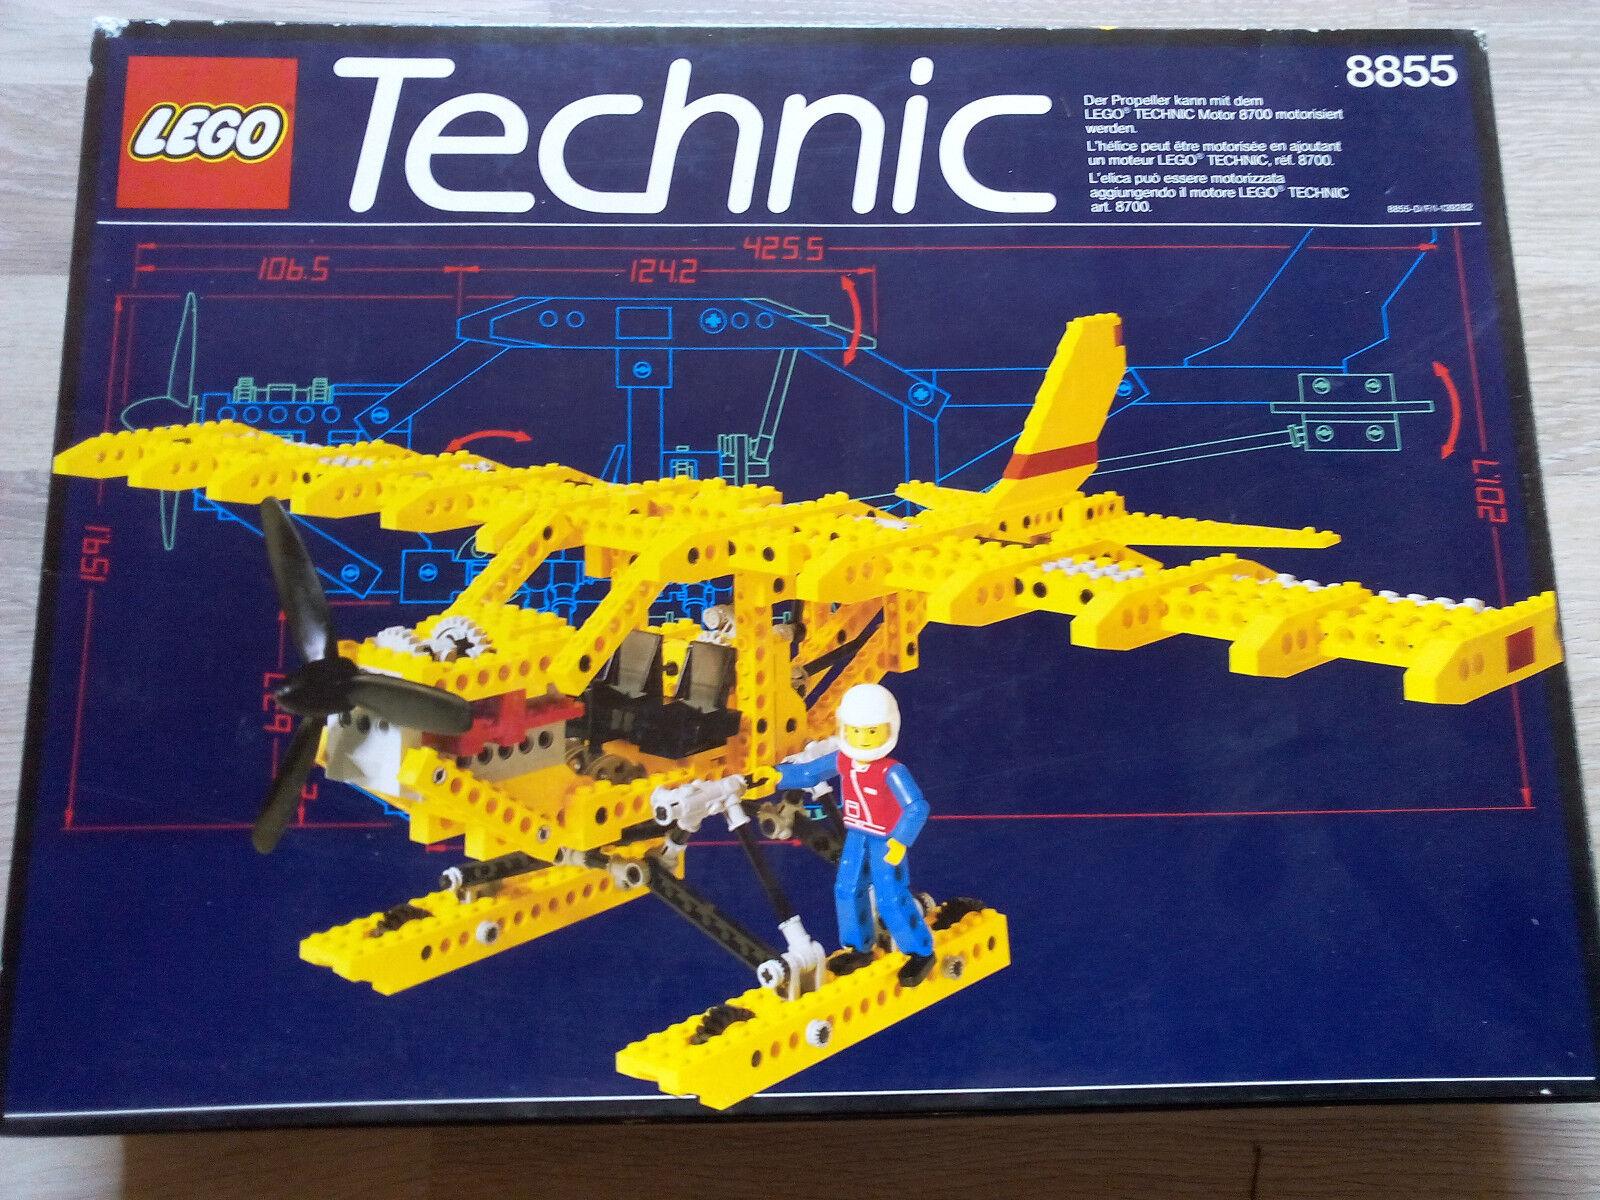 Lego Technic Technik 8855 Prop Plane   NEU & OVP - RARITÄT